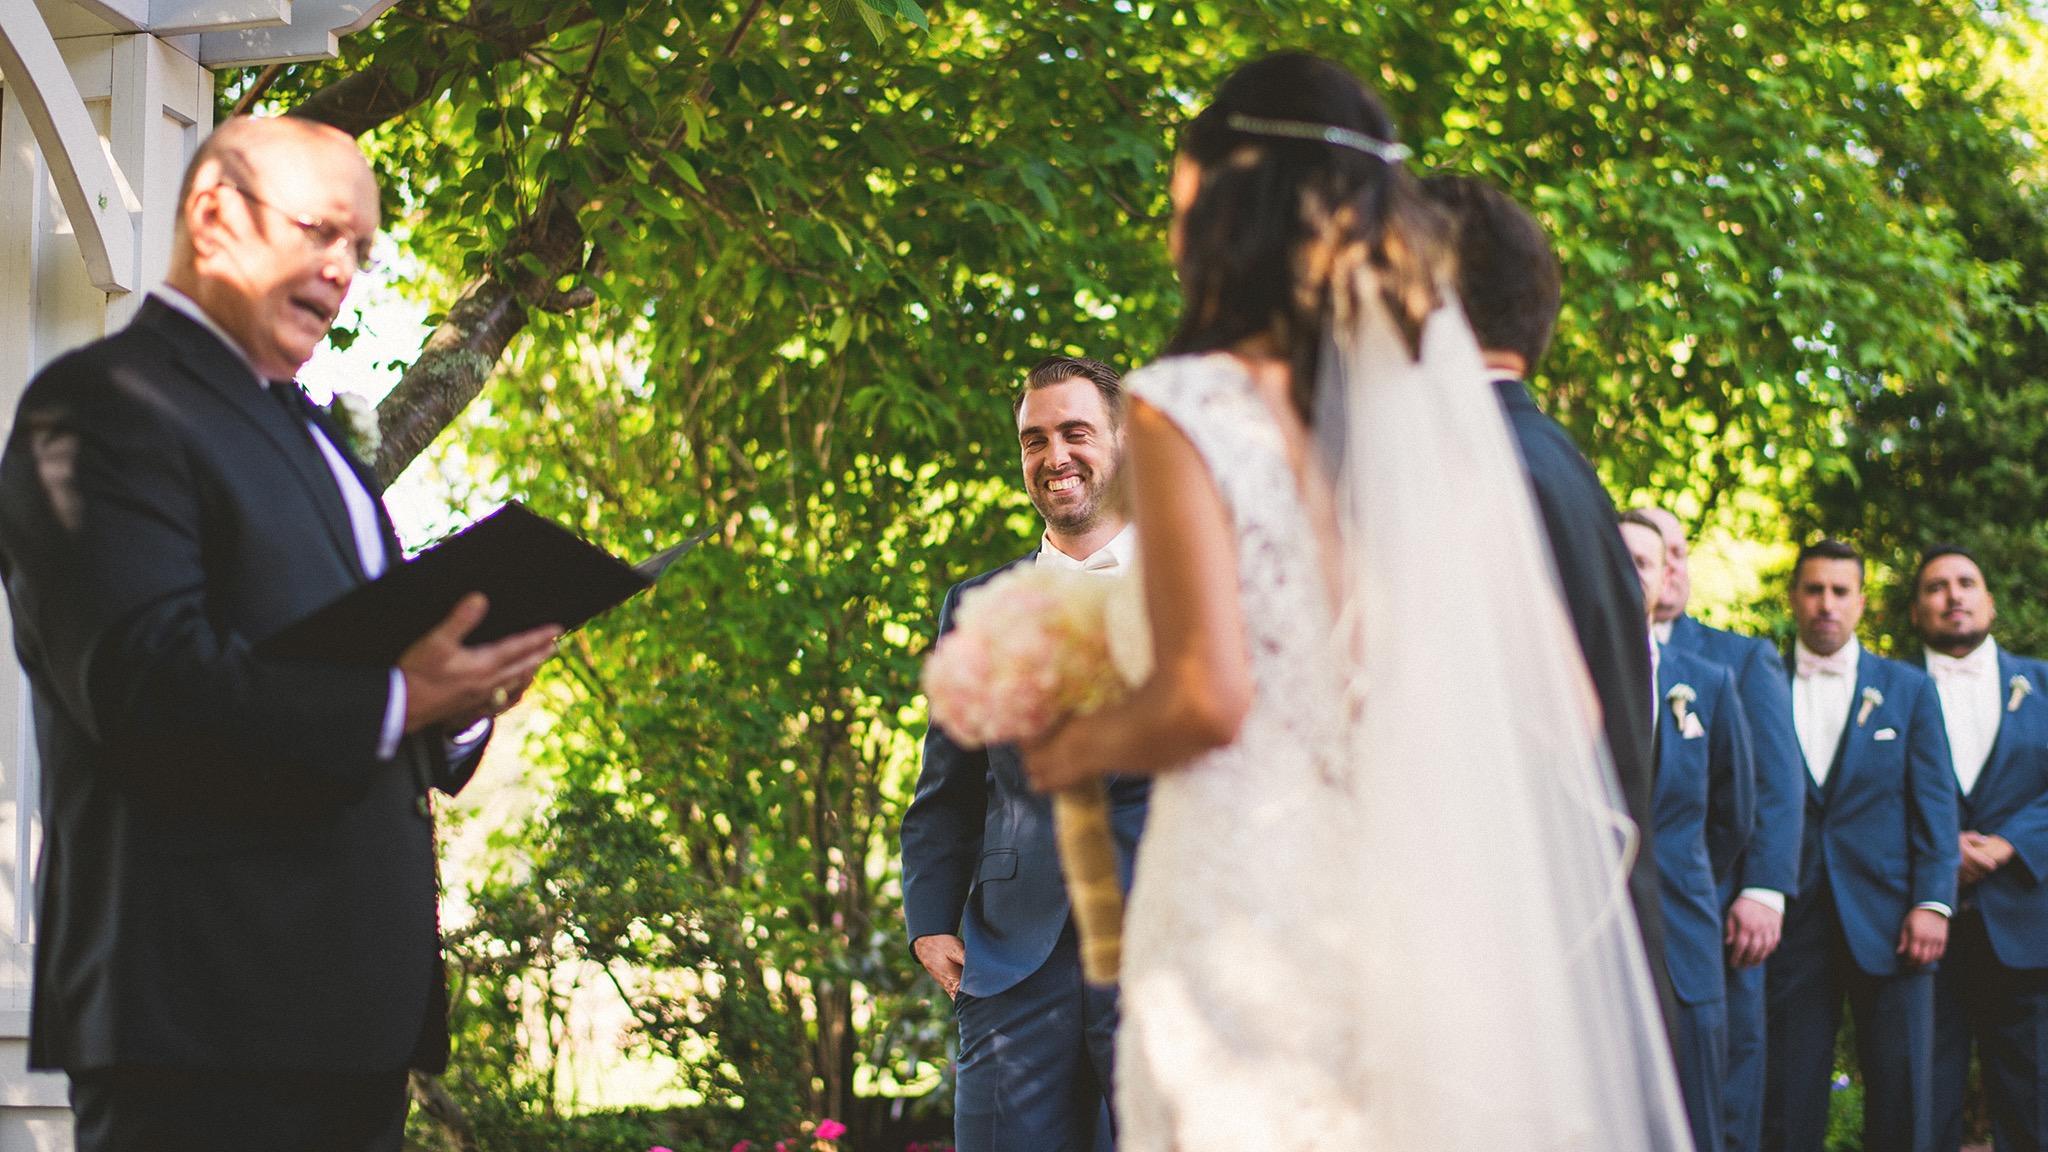 49-wedding-ceremony-candids.jpg